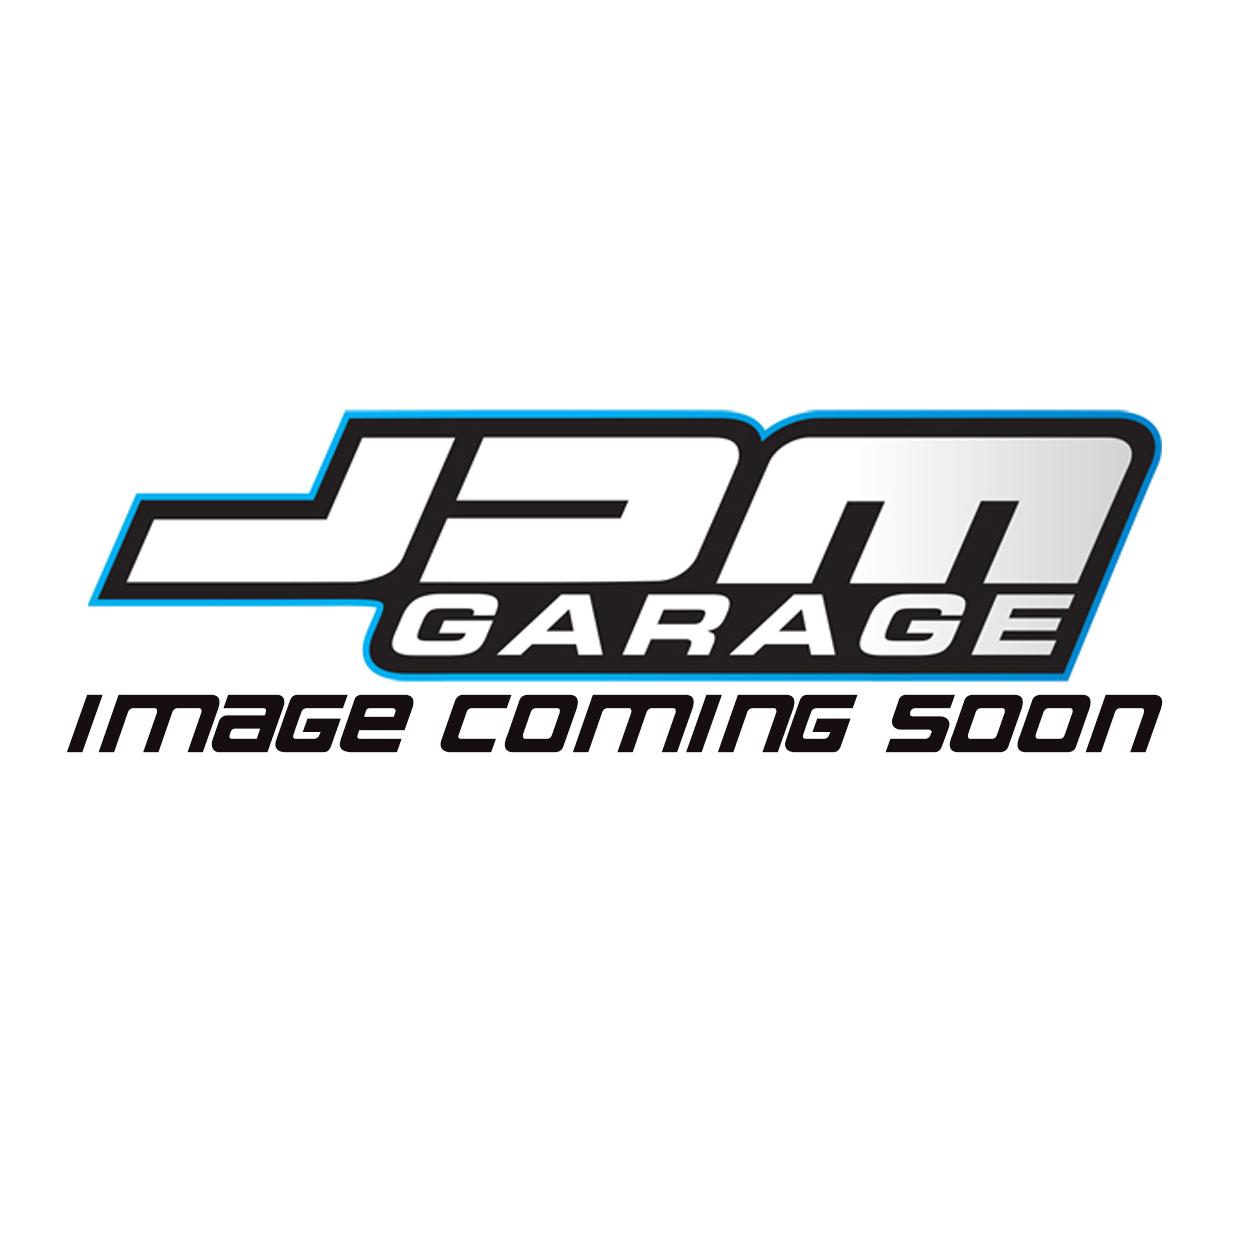 JDMGarageUK Replacement Water Pump For Toyota Chaser Soarer Supra Aristo JZA80 Aristo Supra 2JZ-GTE